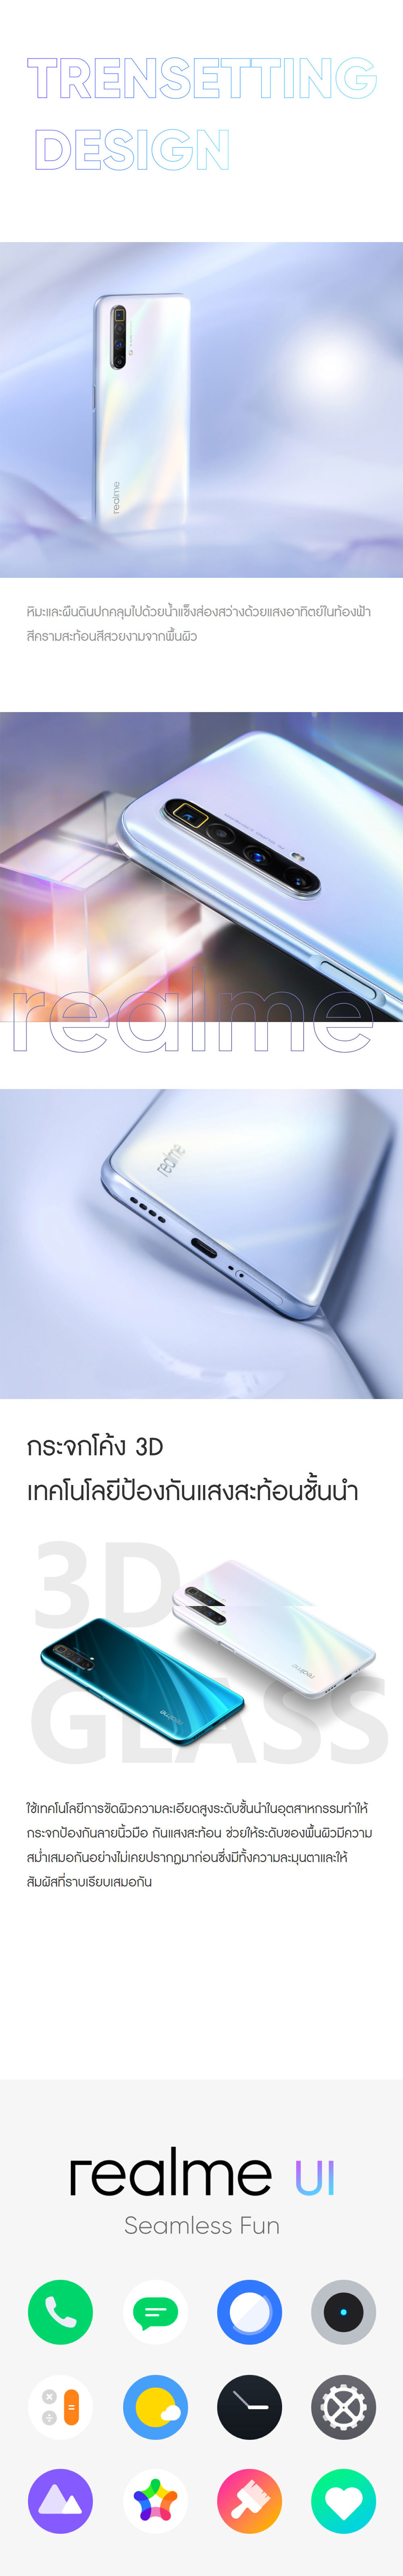 03-3000086087-feature-2_3.jpg